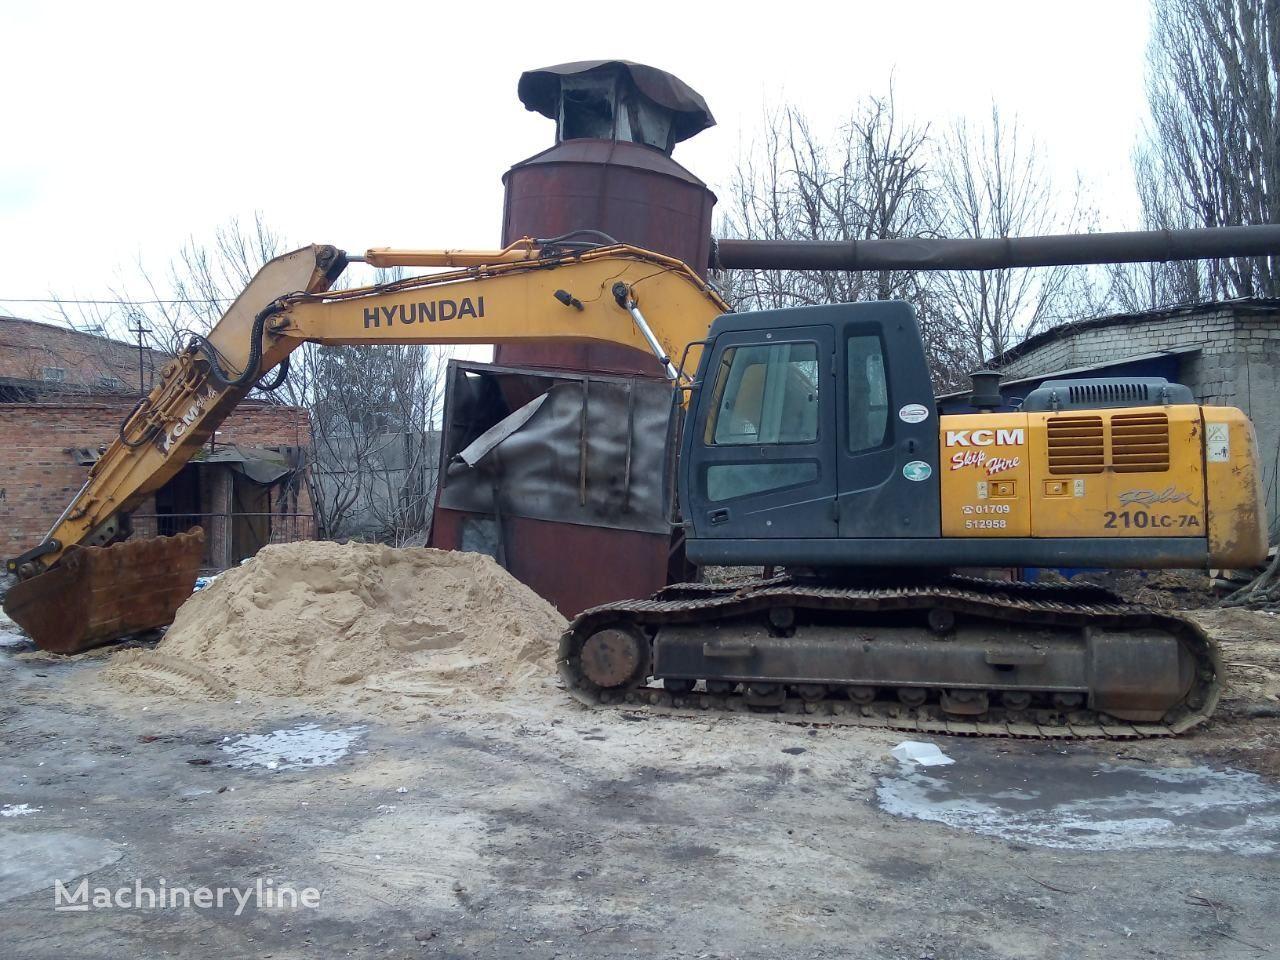 HYUNDAI Robex 210 LC-7A tracked excavator